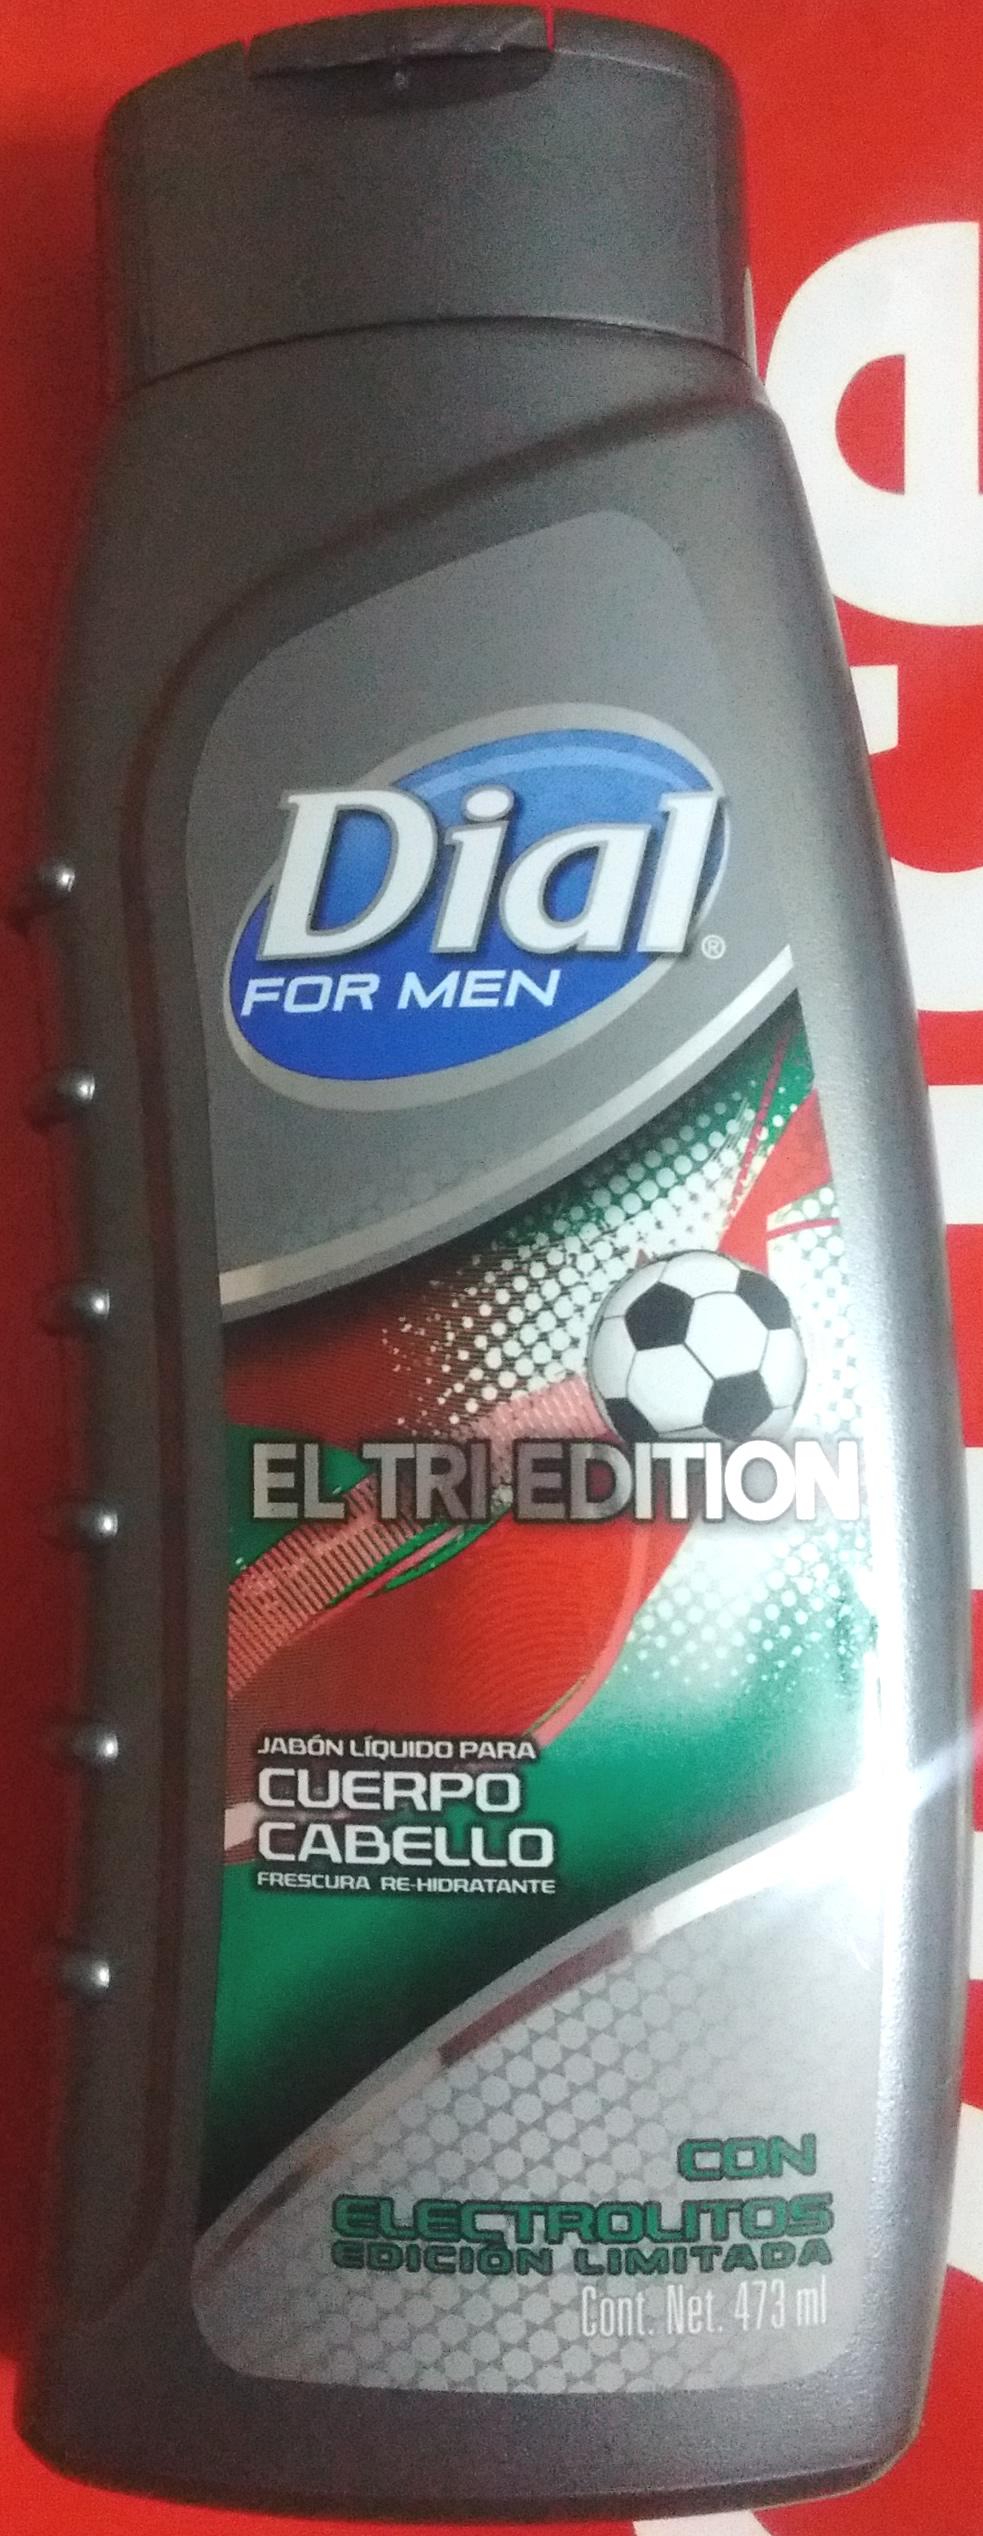 Walmart Toltecas: Jabón Líquido Corporal Dial For Men